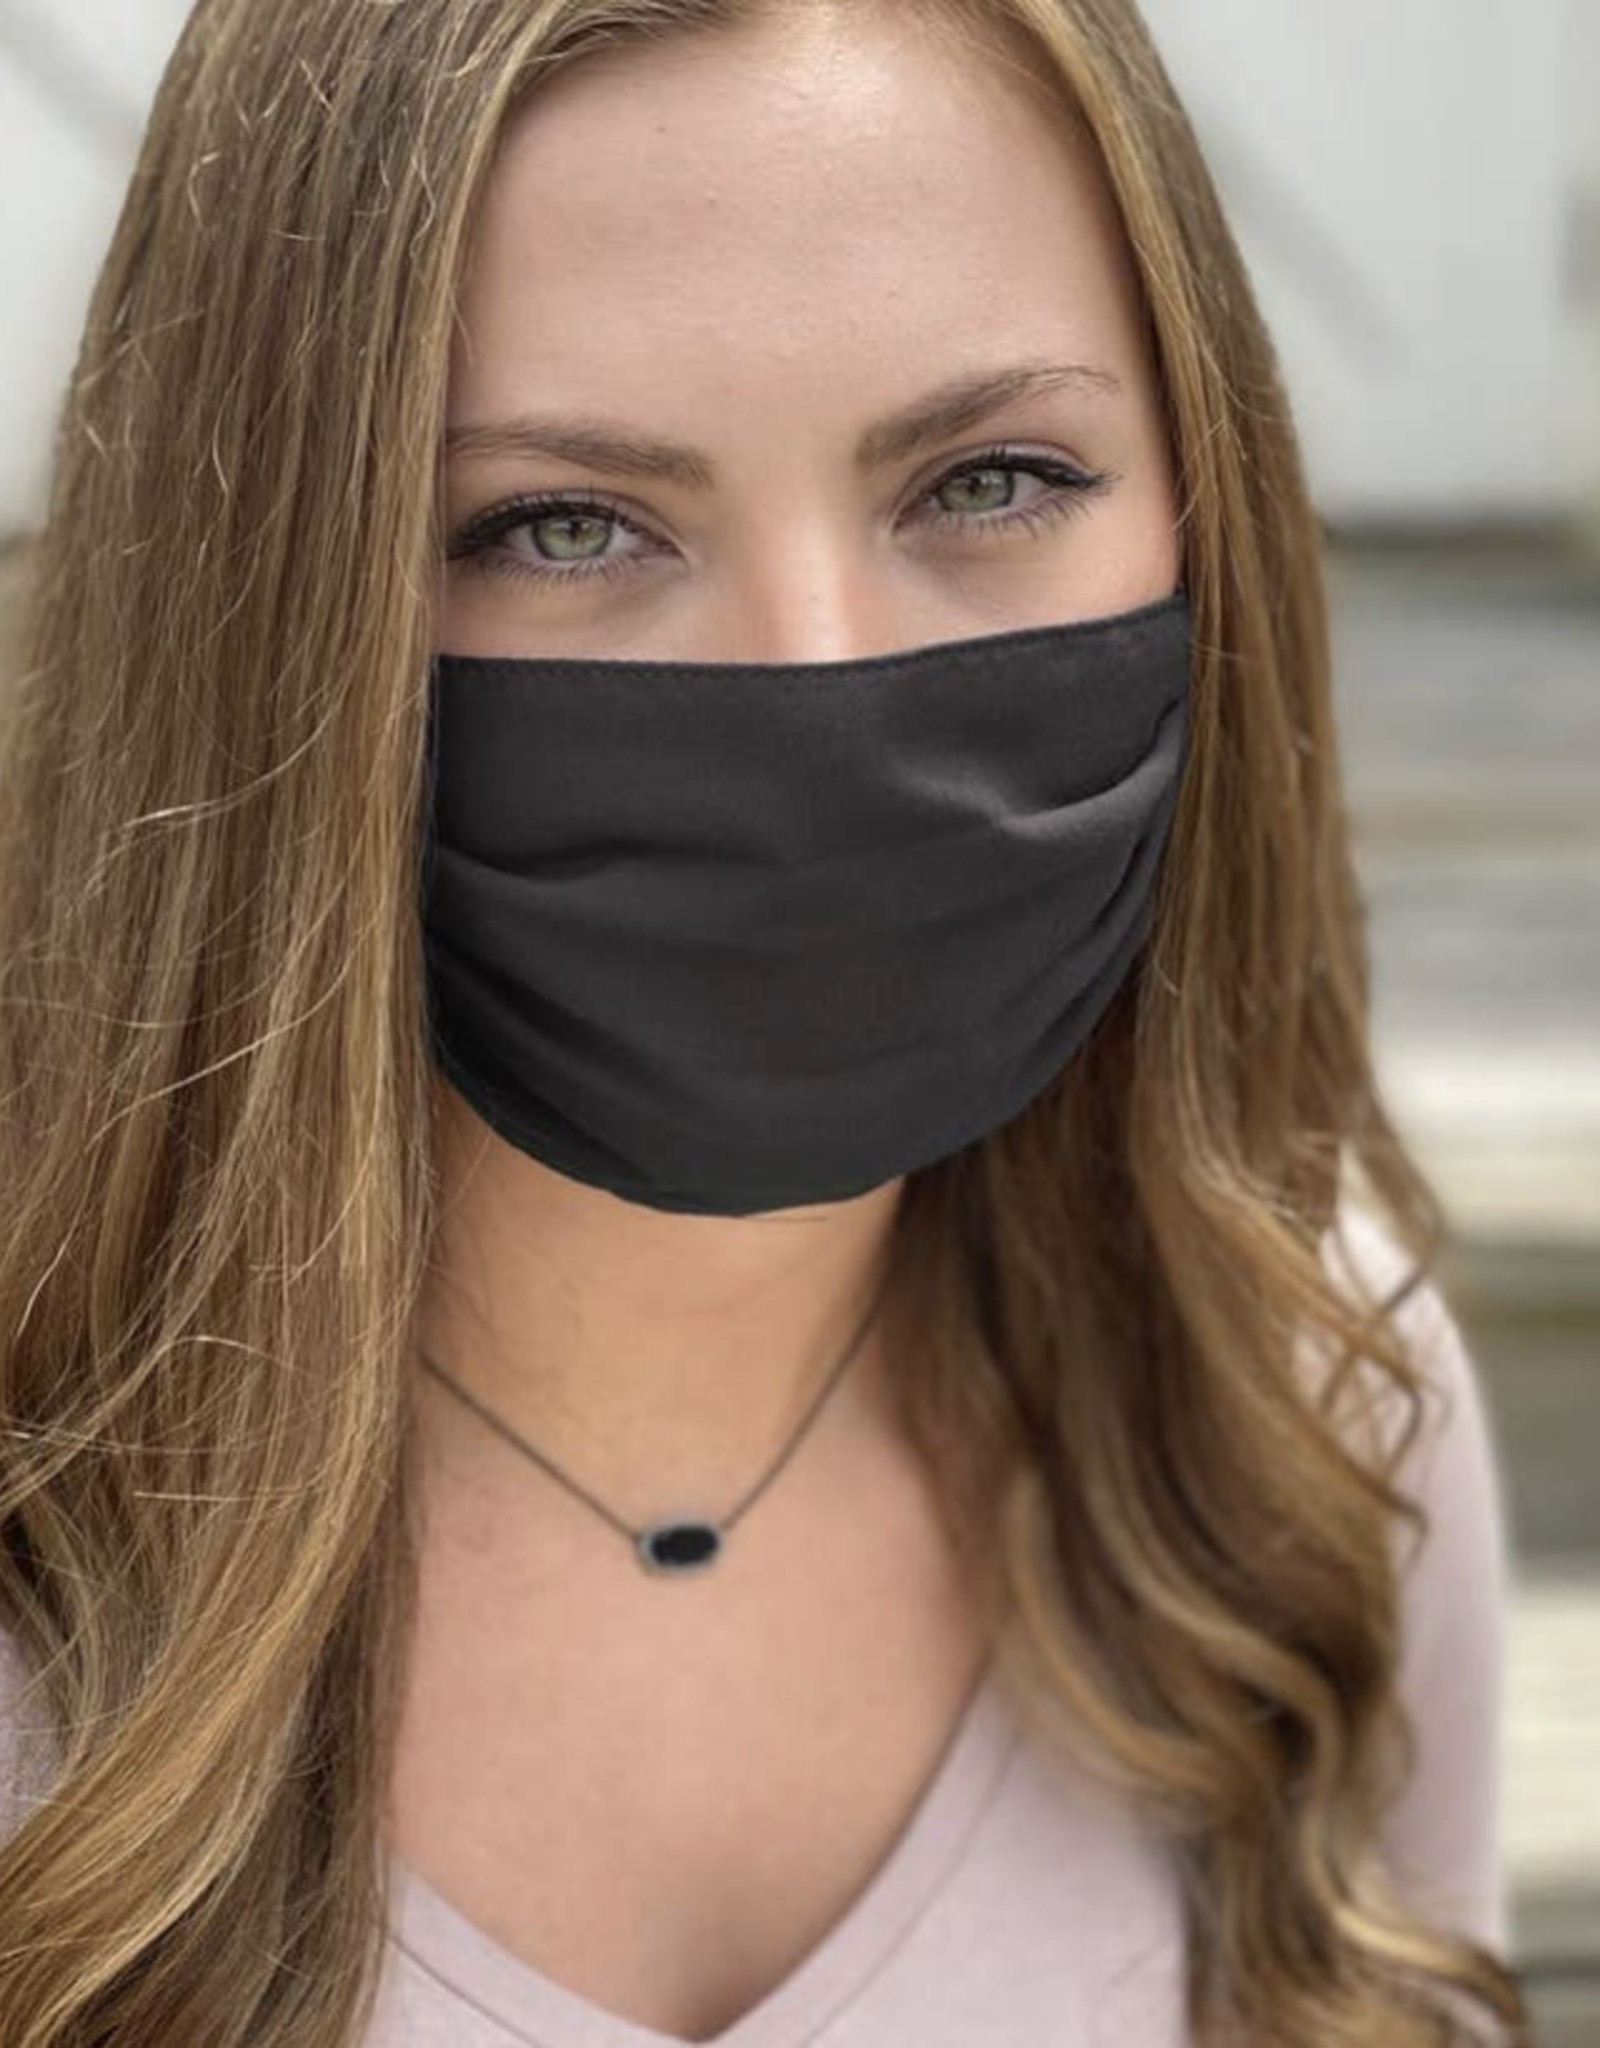 Salt and Palms Black face mask